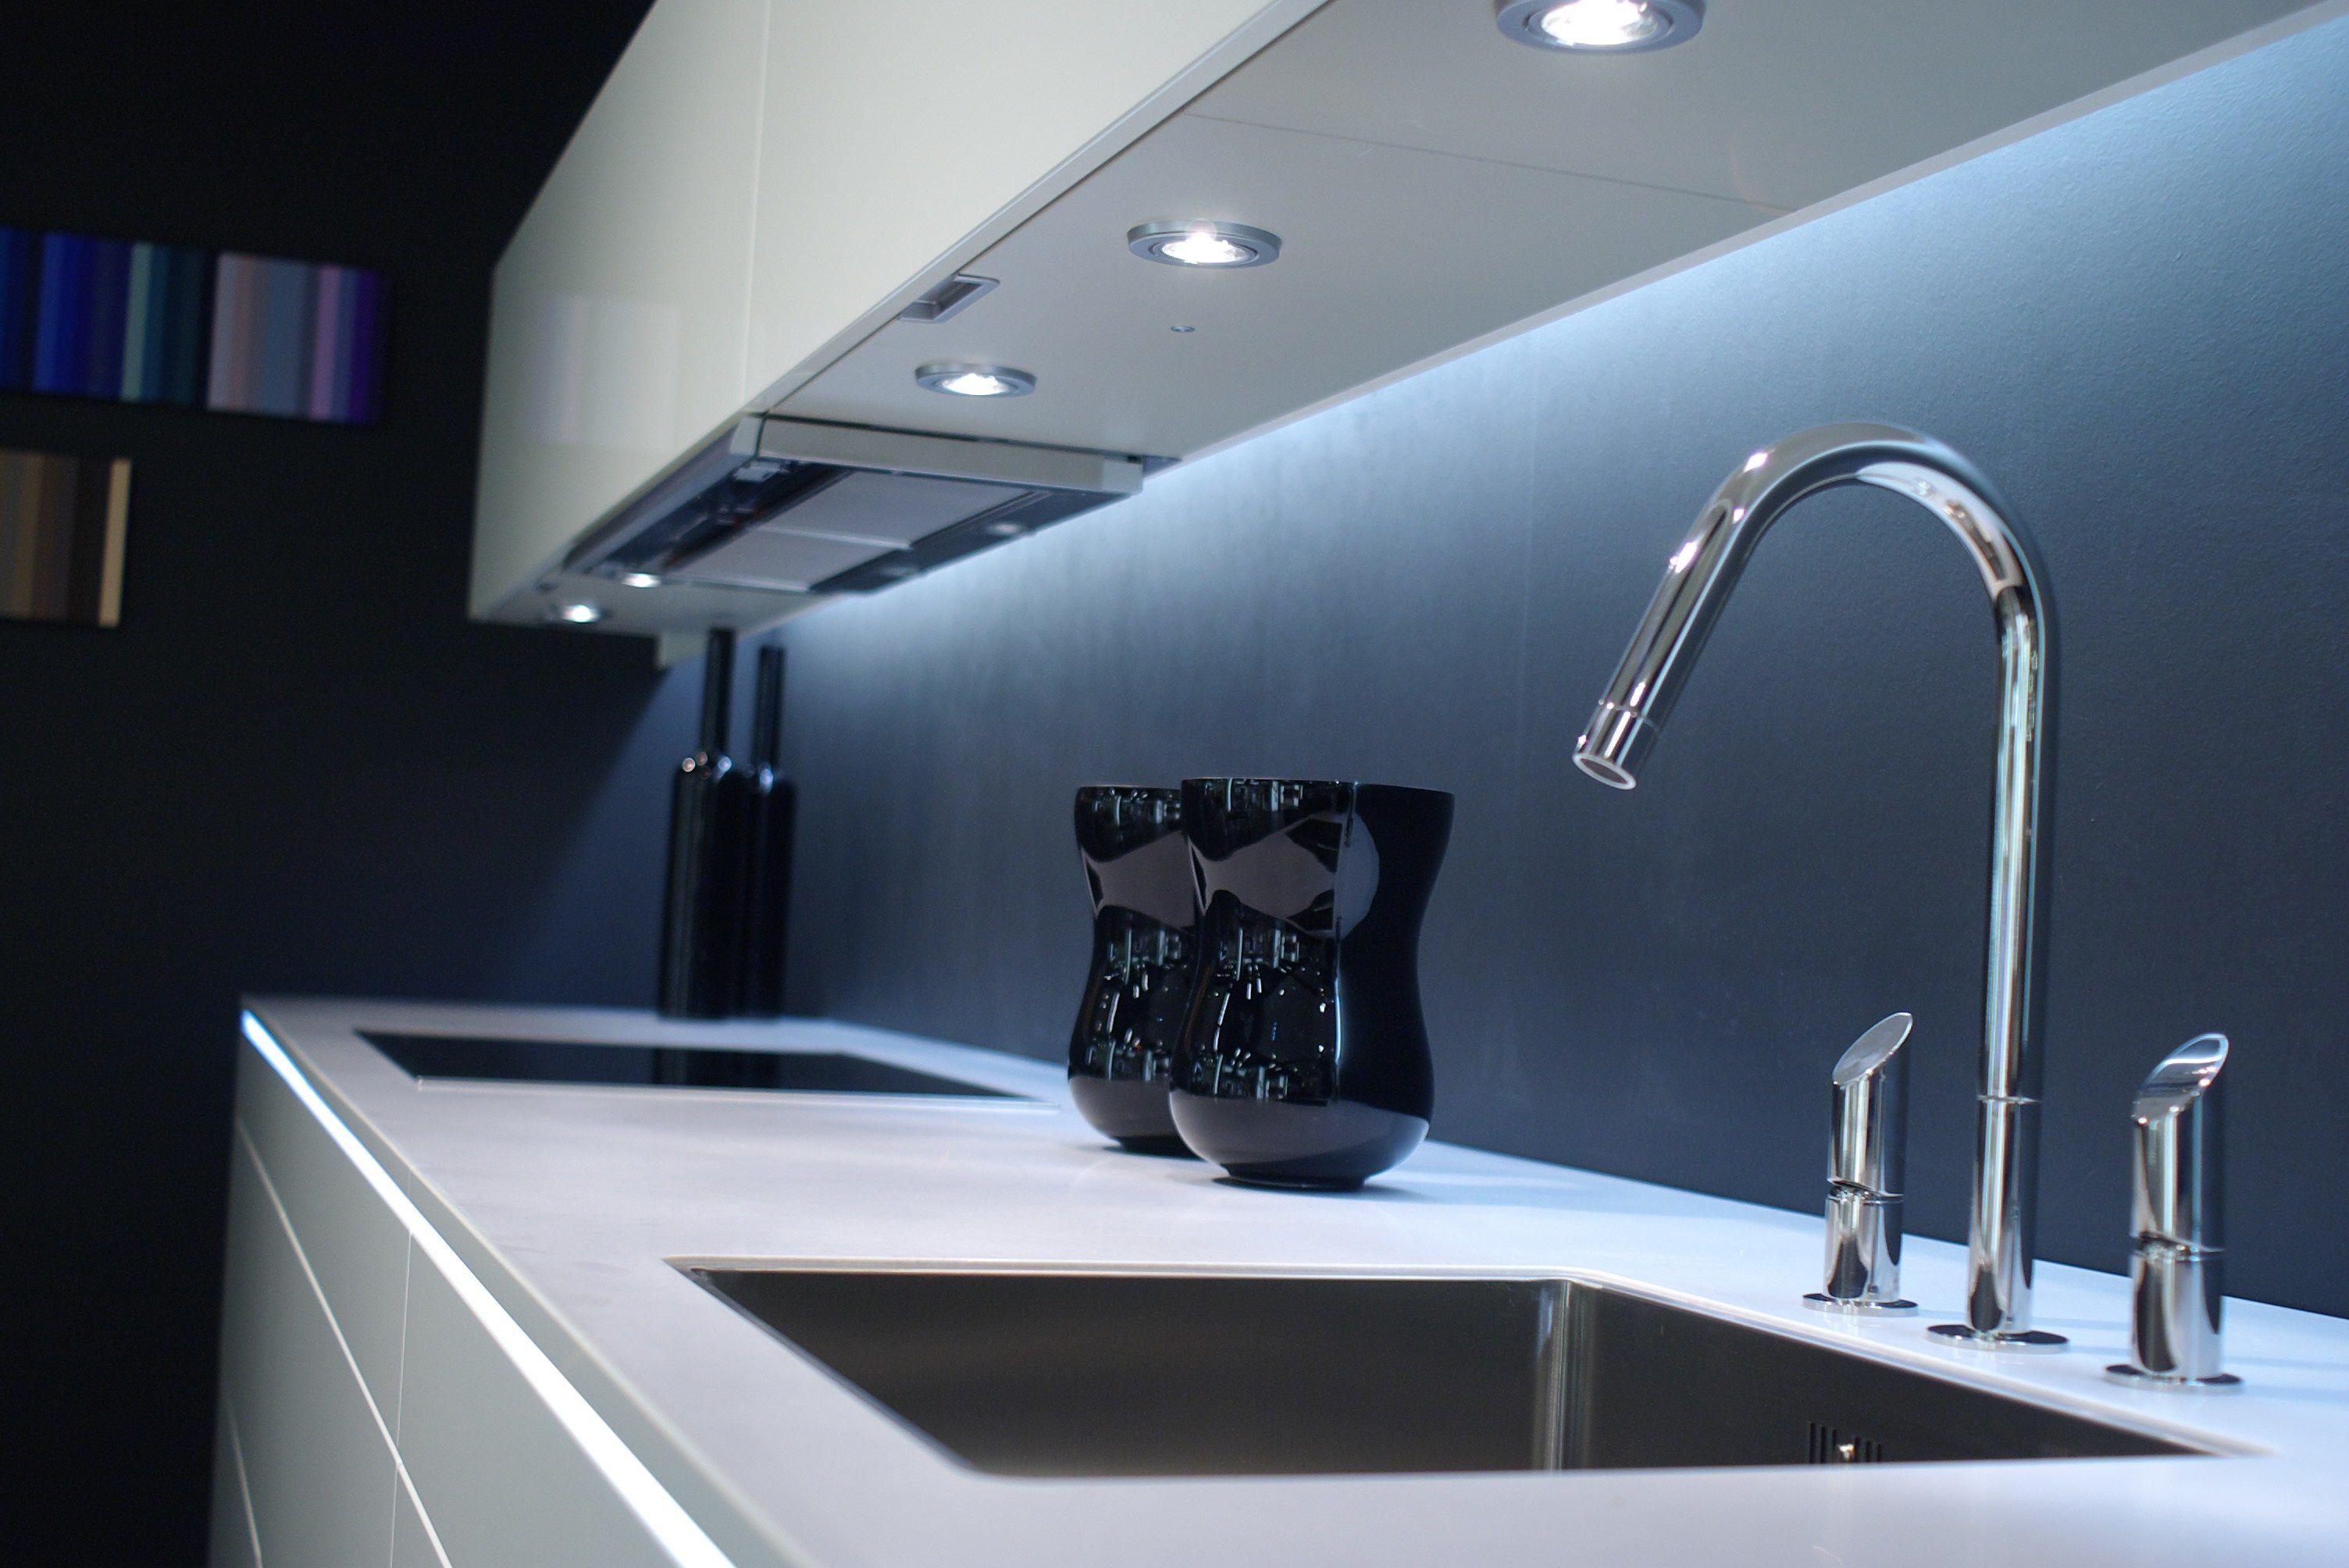 Cabinet Lighting Options Modern Kitchen Sink Cabinet Lighting Modern Kitchen Lighting Cabin Modern Kitchen Sinks Modern Kitchen Lighting Kitchen Light Fittings